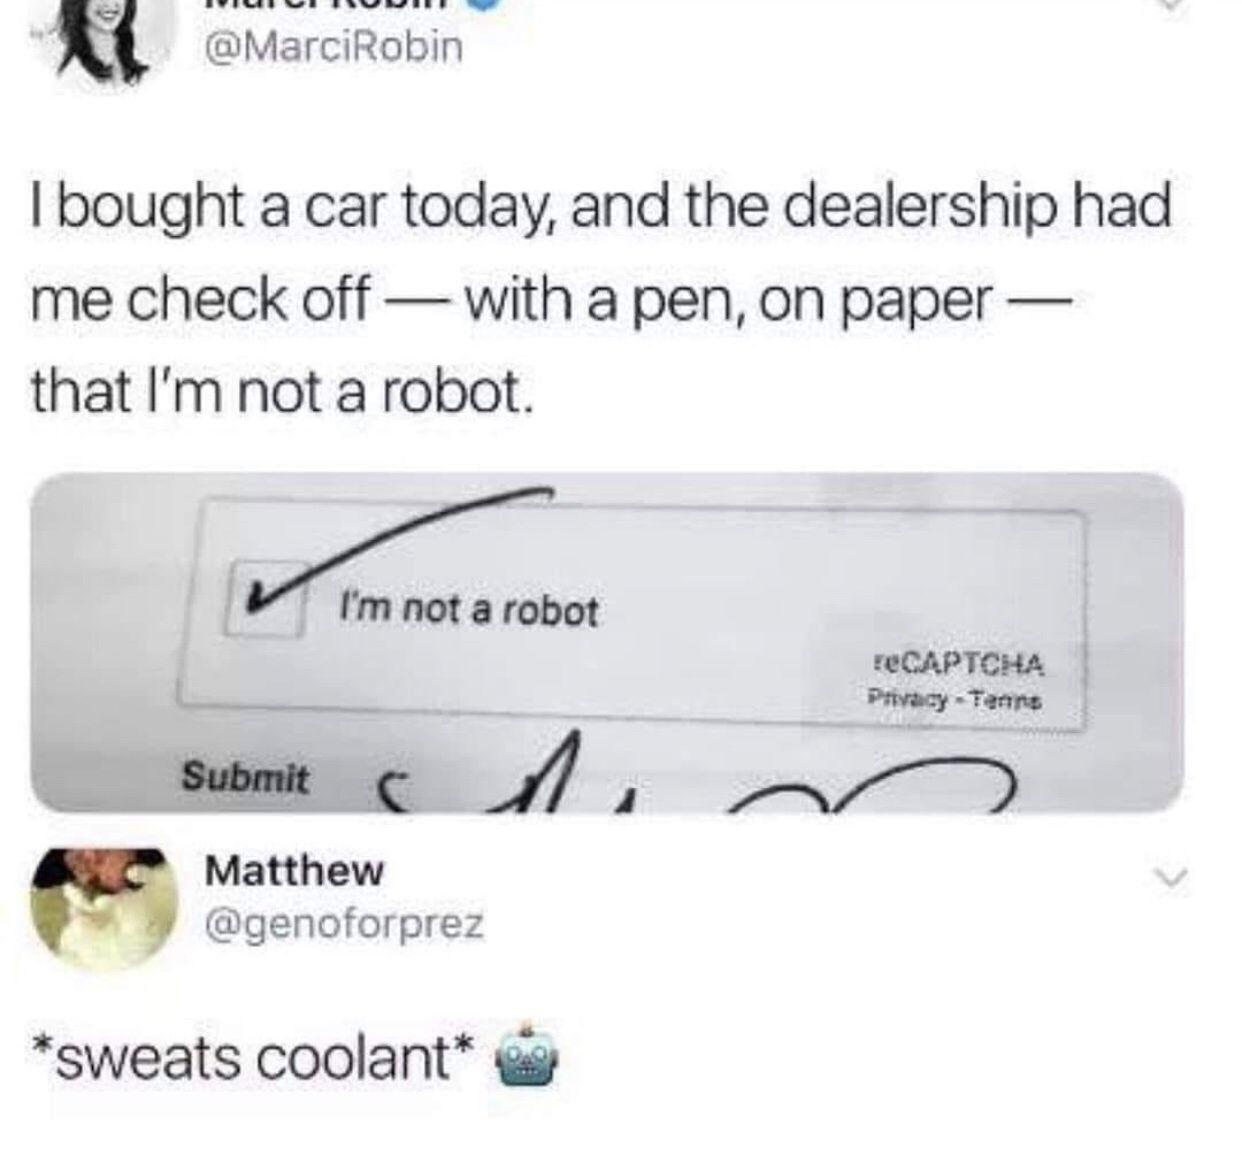 Greetings fellow humans